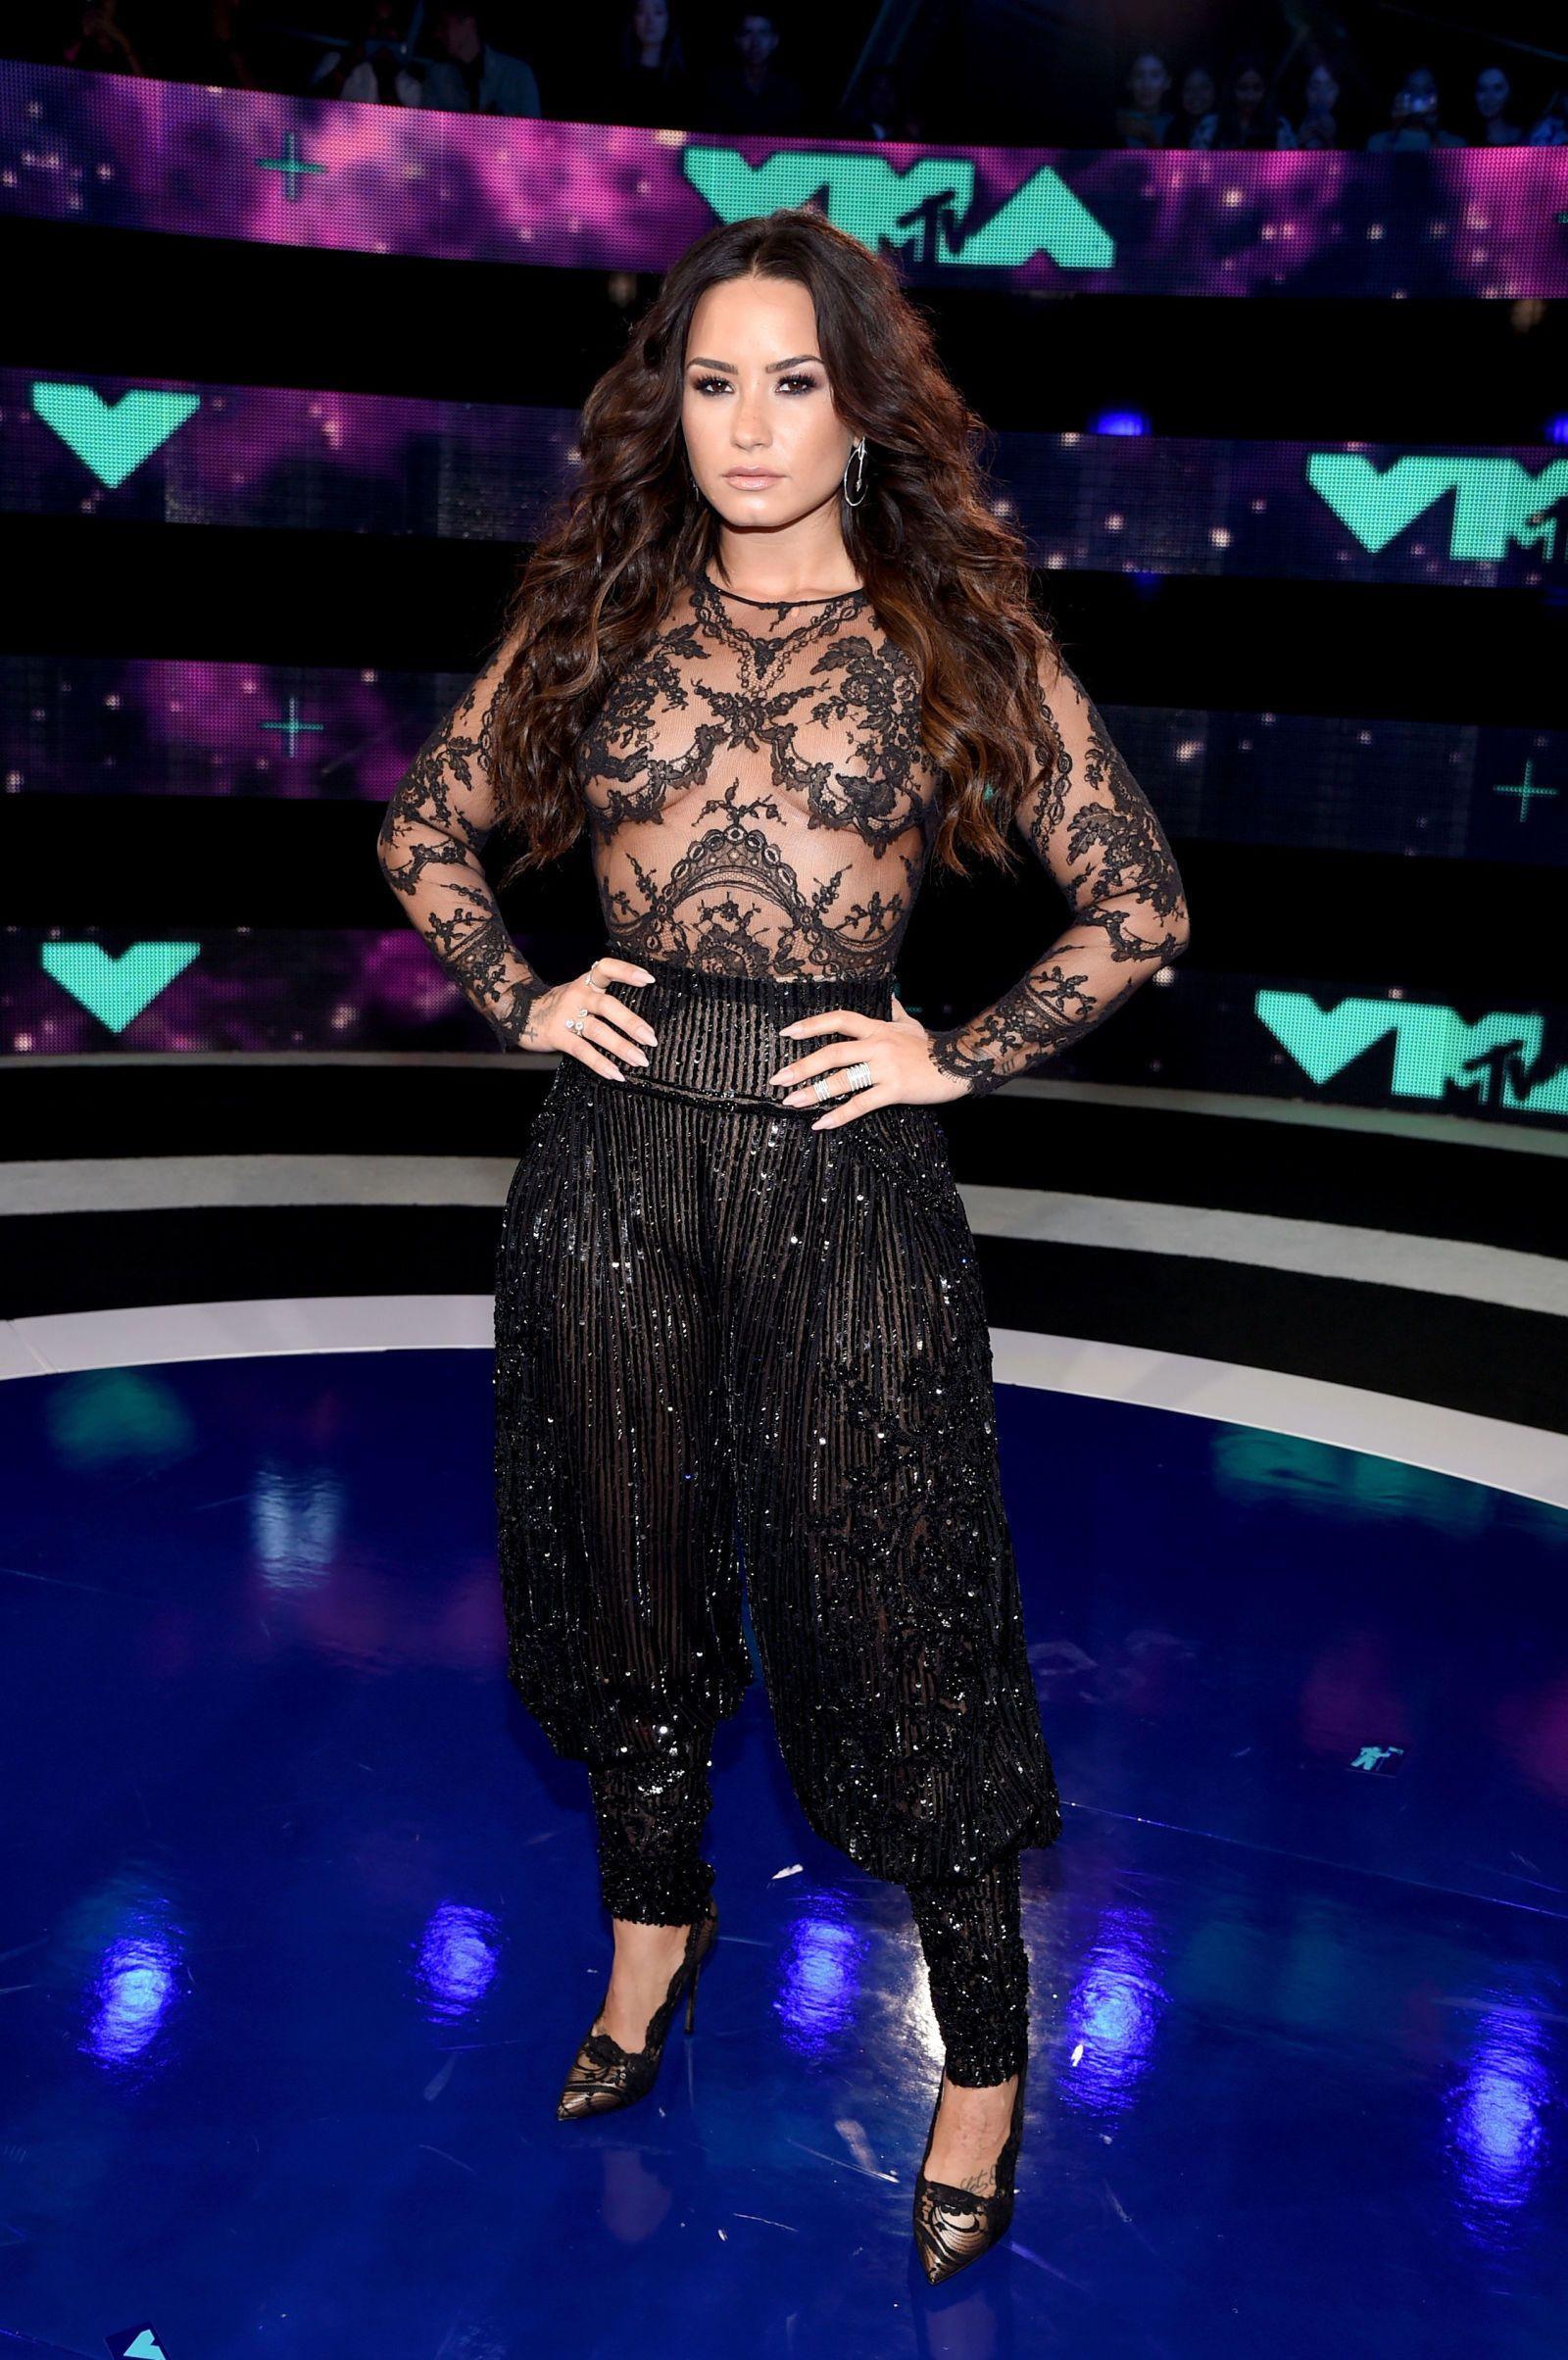 Paparazzi Demetria Lovato nudes (31 foto and video), Tits, Hot, Feet, underwear 2006